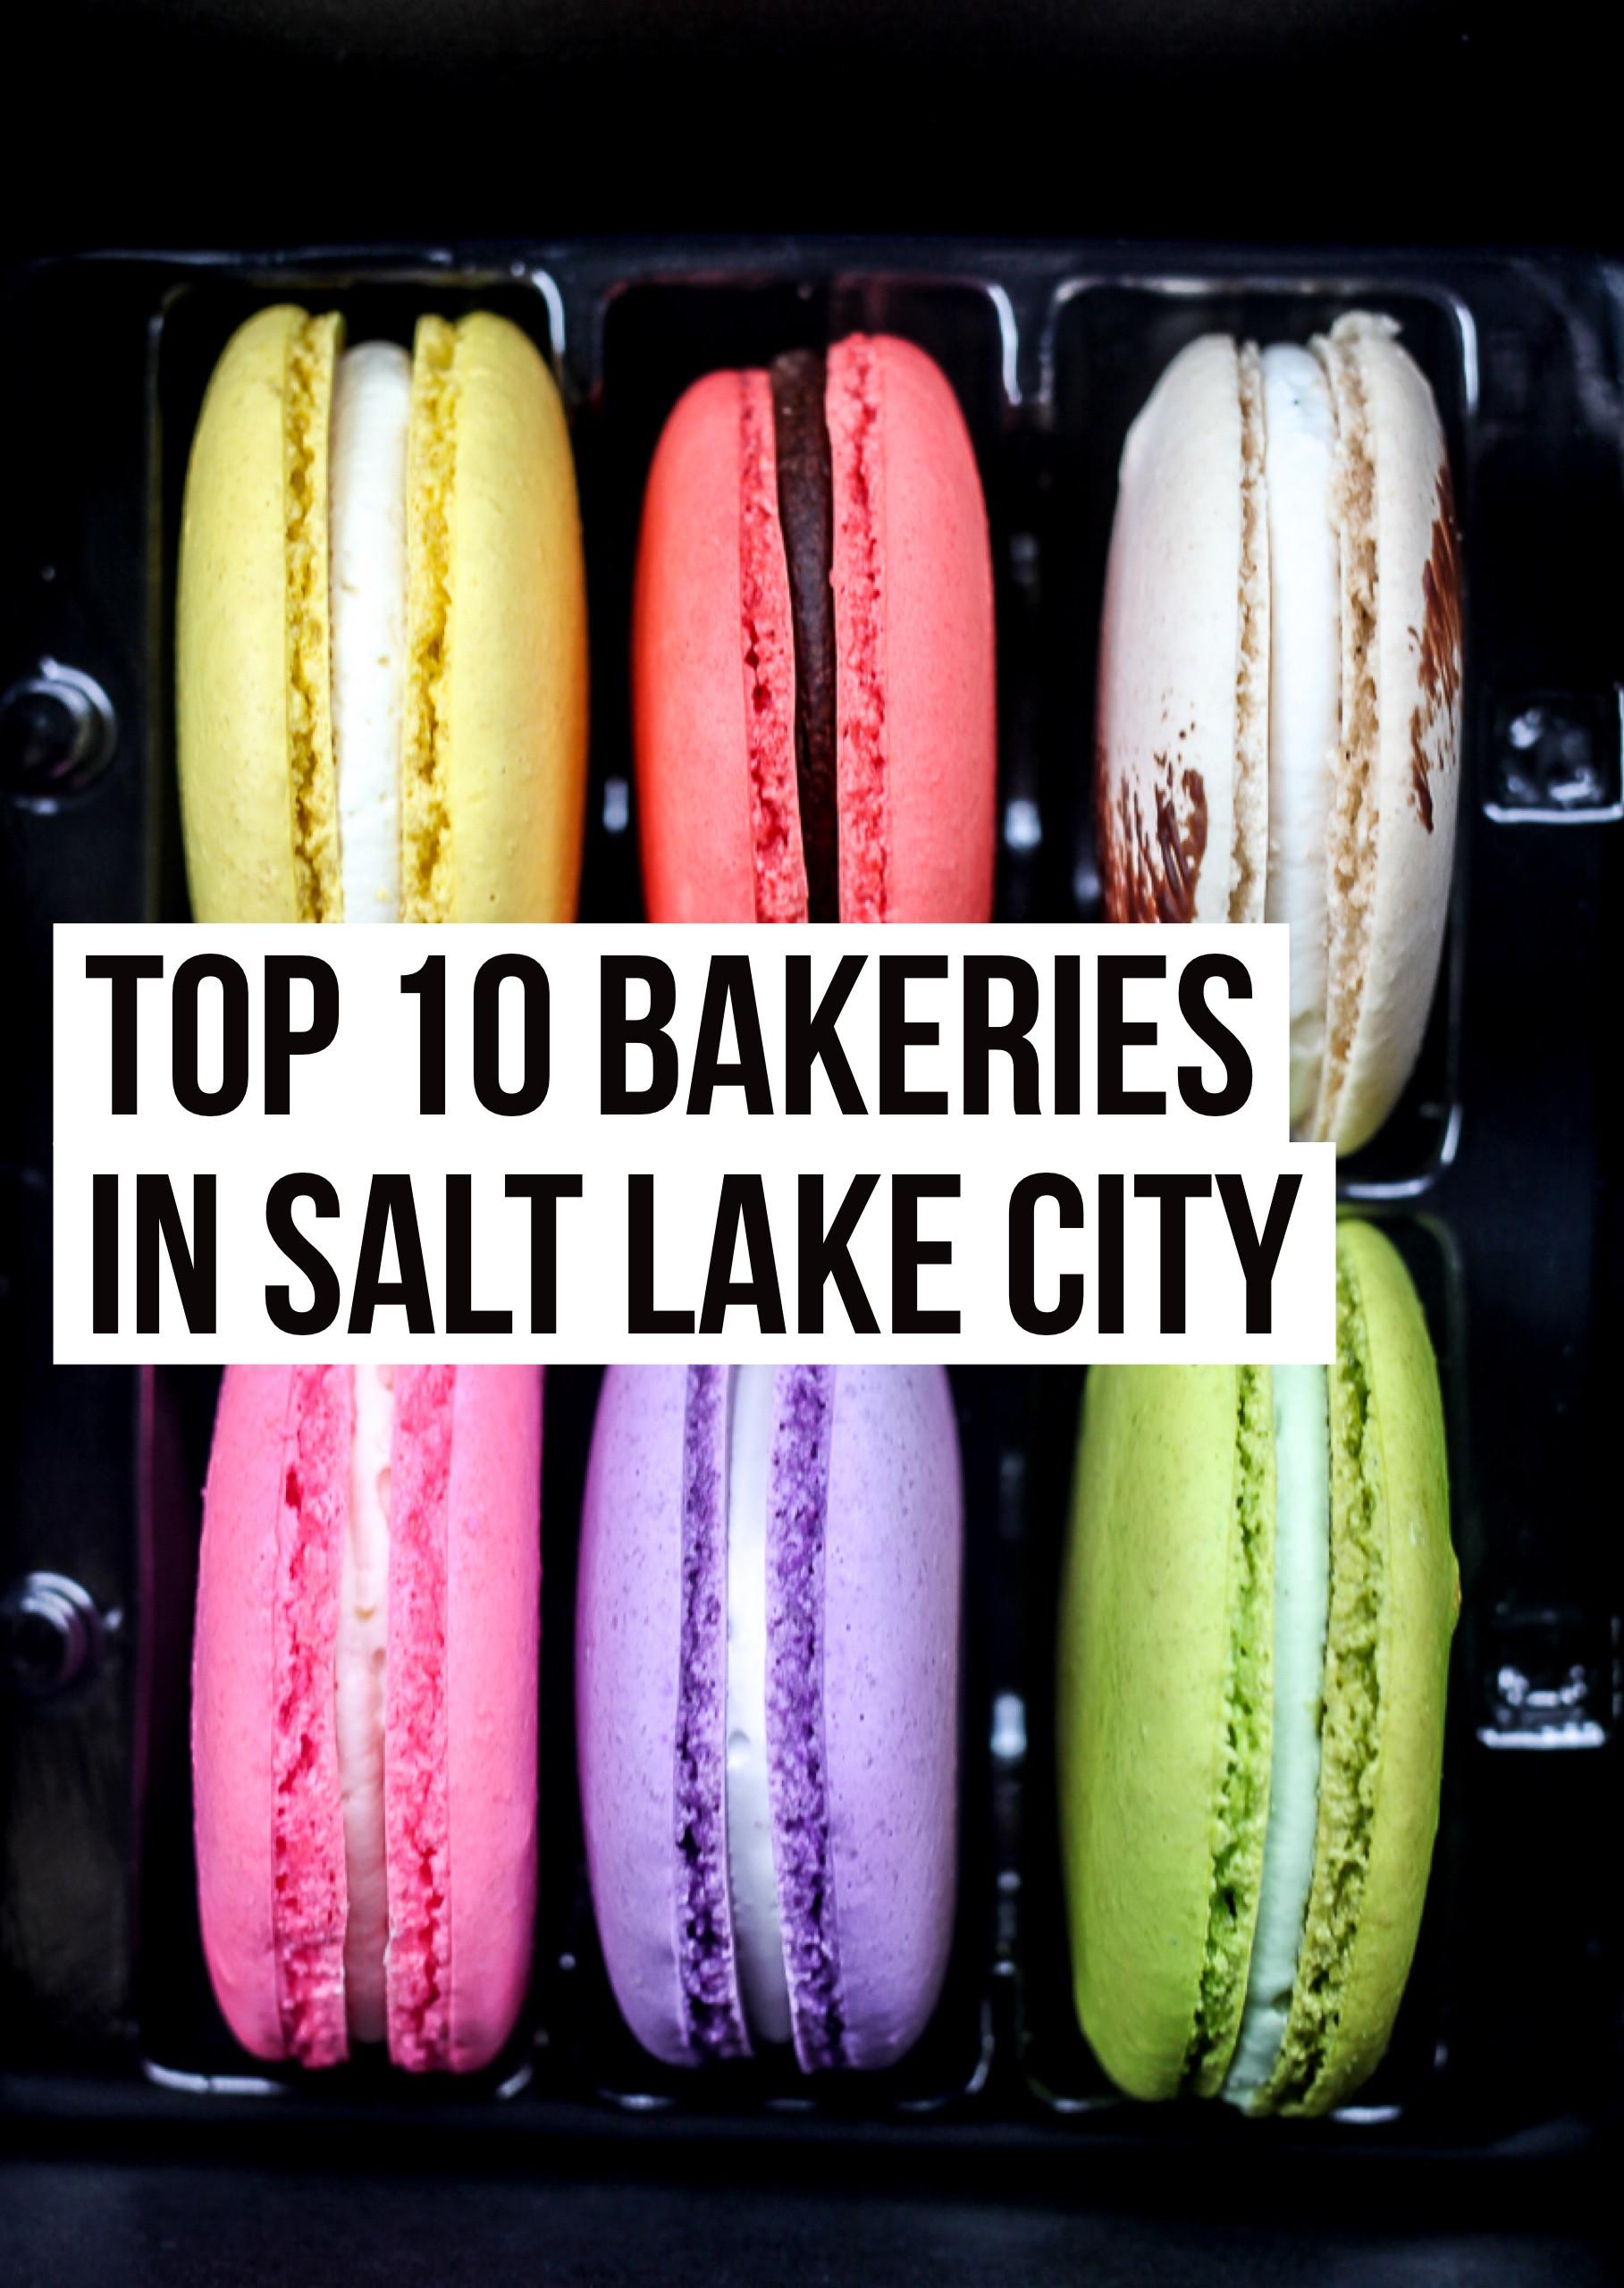 Best Desserts In Salt Lake City  Top 10 Bakeries in Salt Lake City